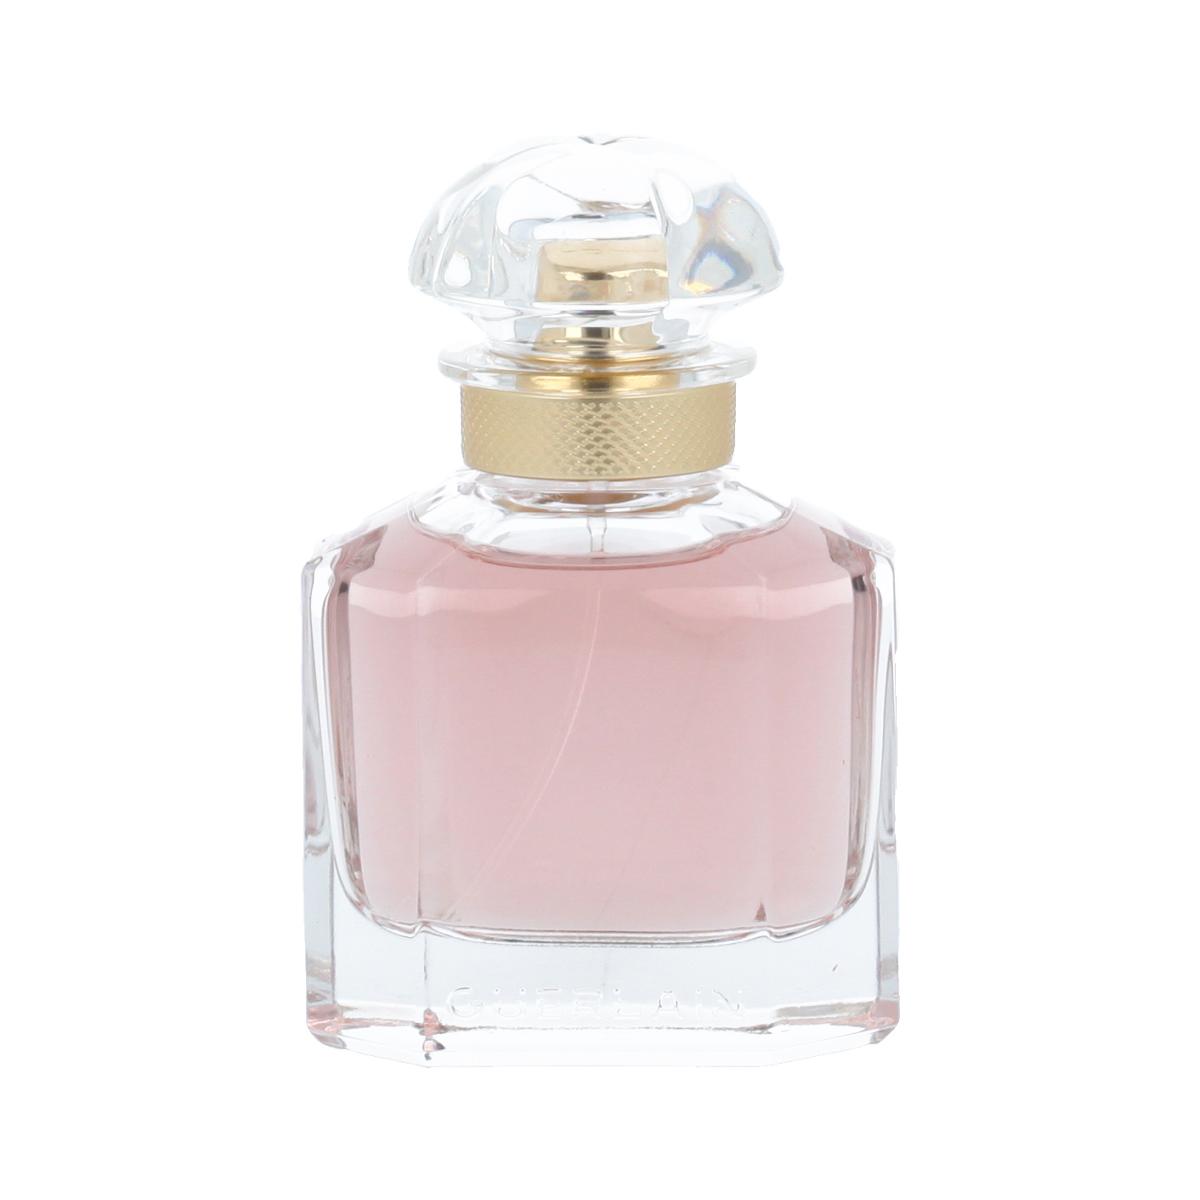 Guerlain Mon Guerlain Eau De Parfum 50 ml (woman) 91095